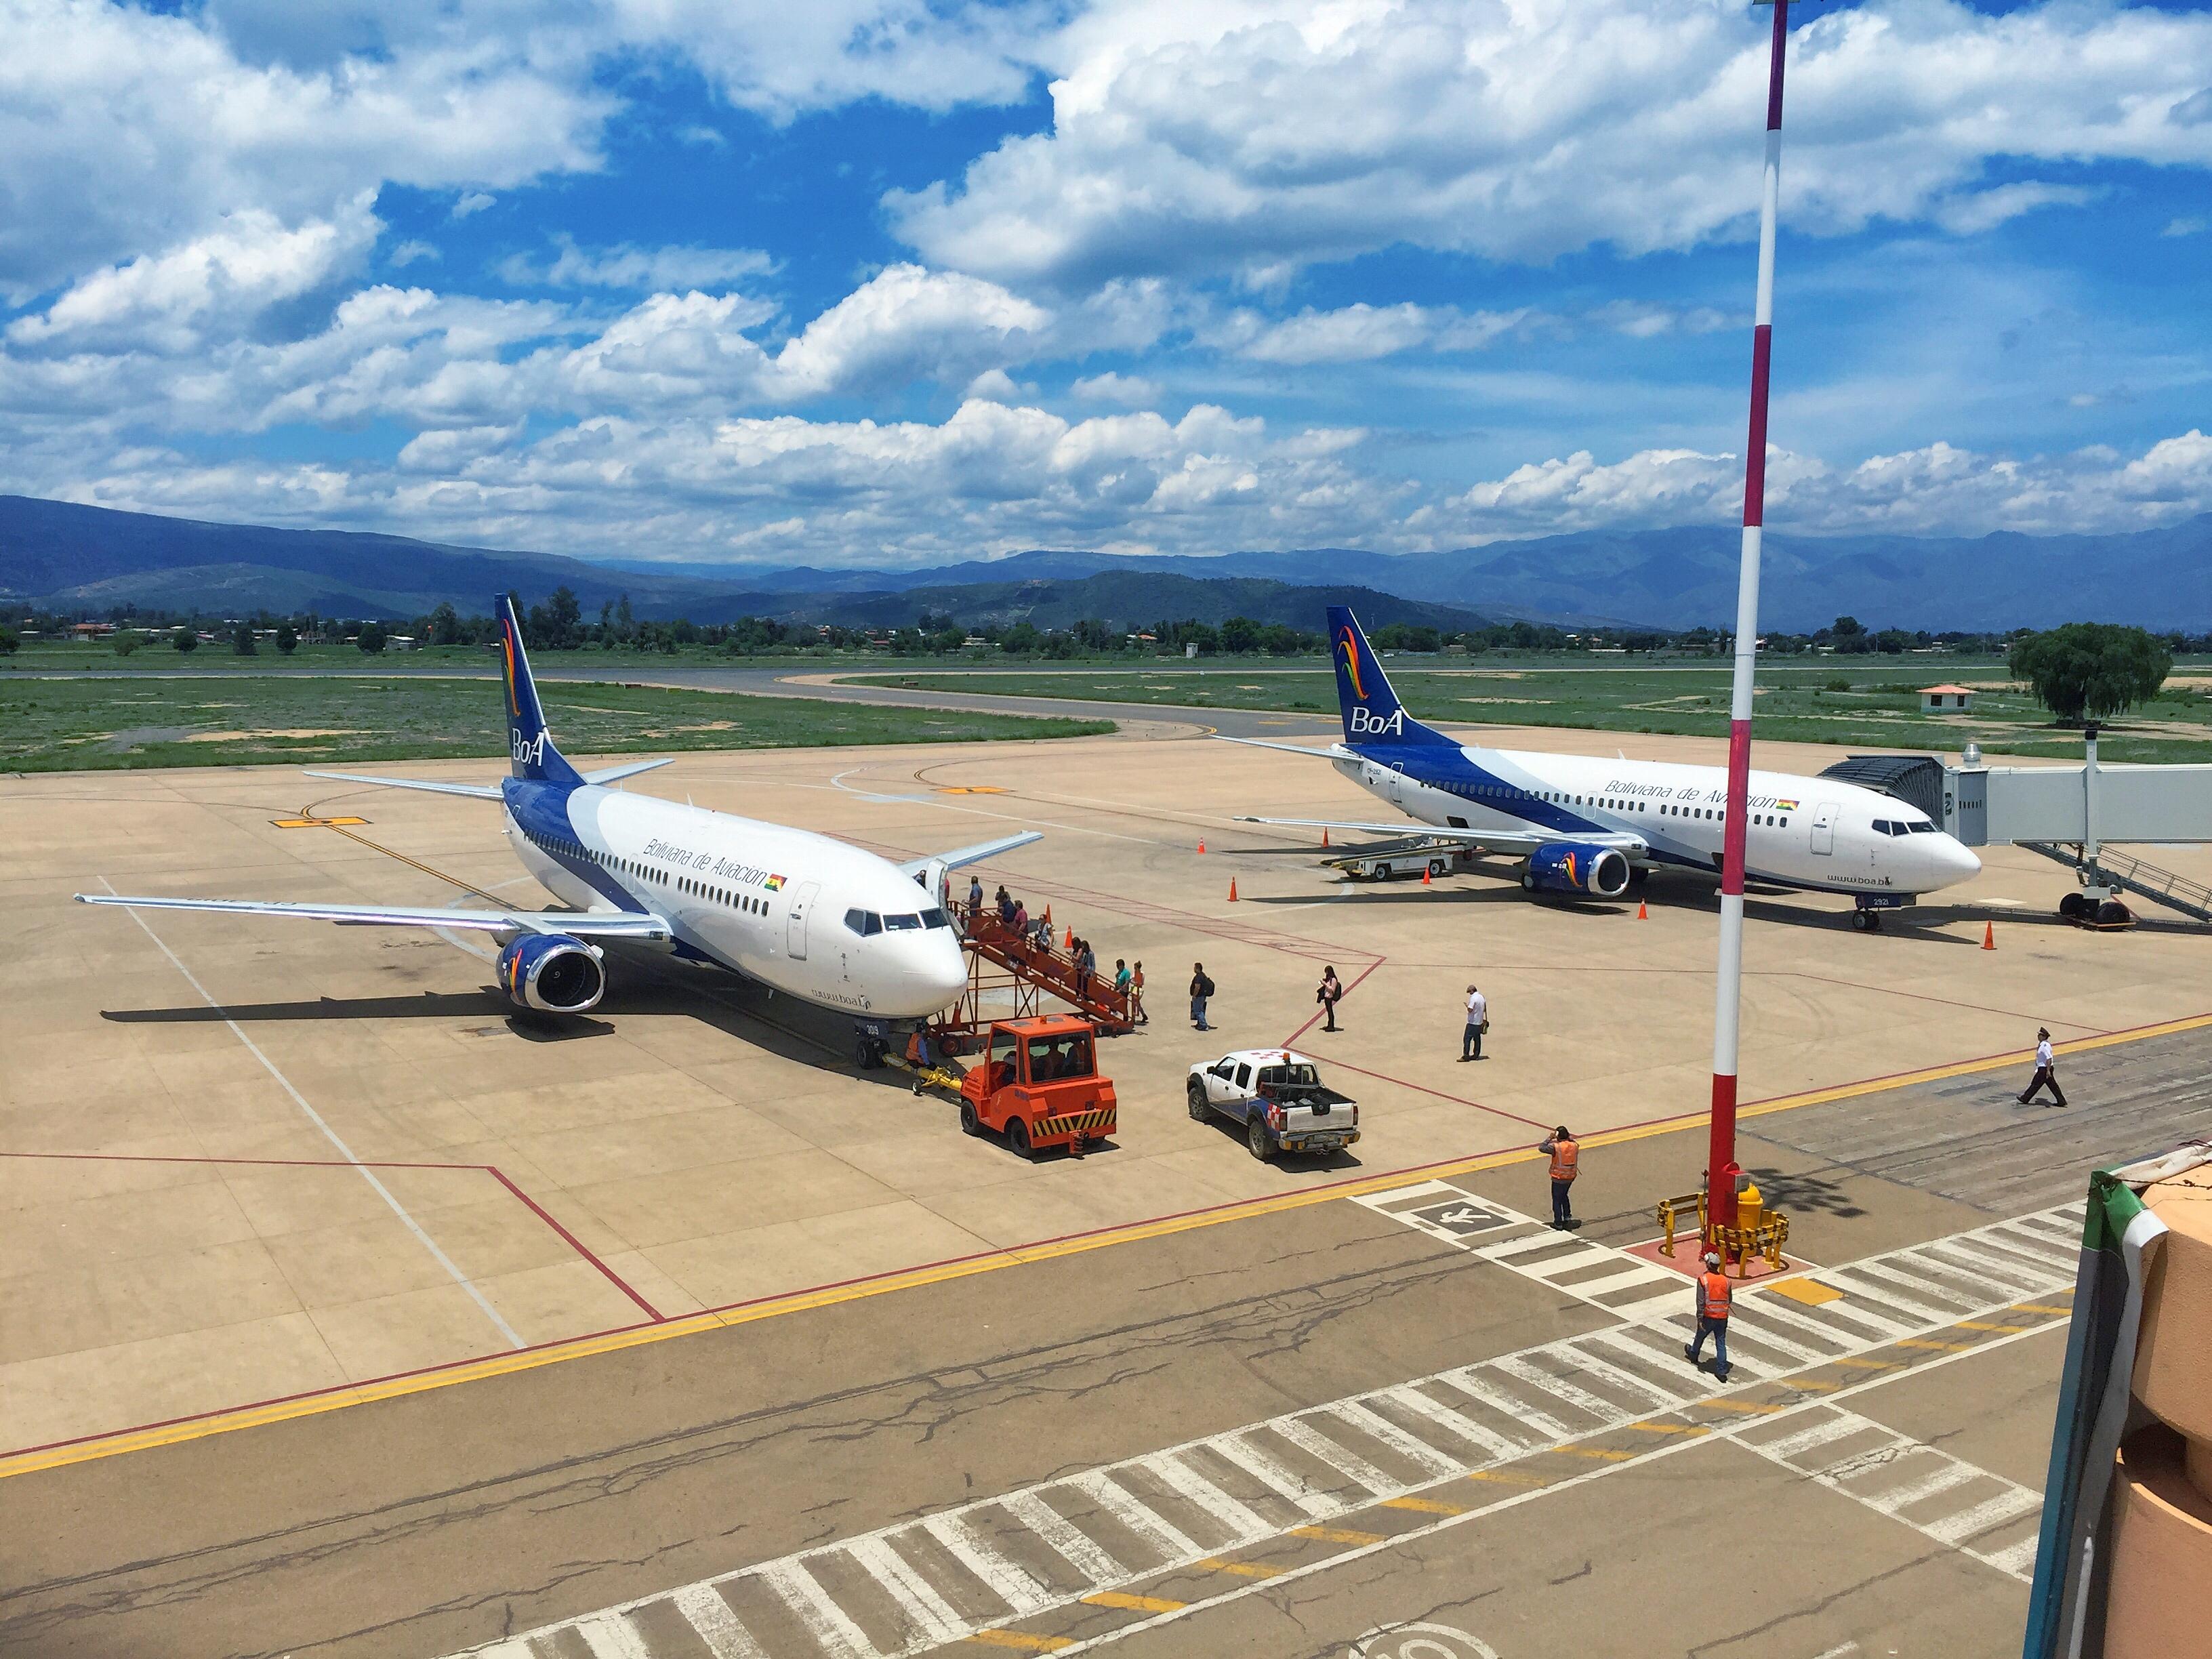 Blue apron wiki - File Aviones De Boa En Cochabamba Jpg